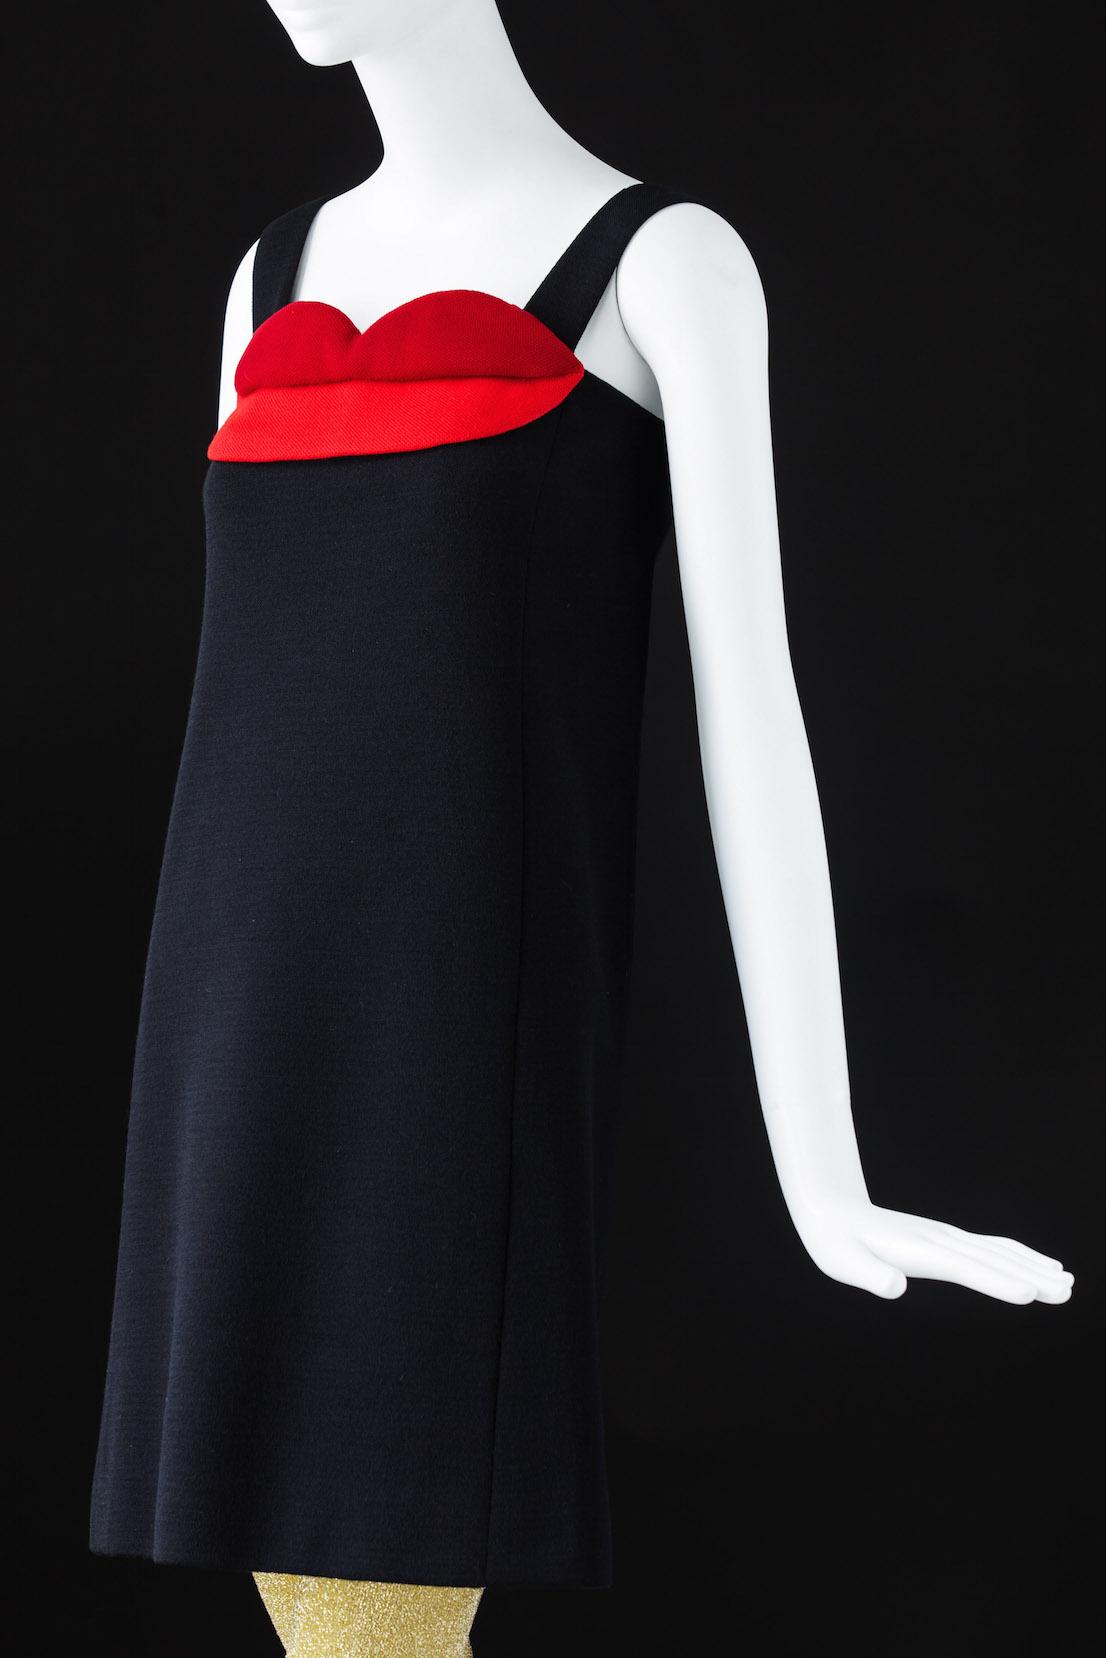 Yves Saint Laurent, Cocktail dress. Fall-Winter 1966. Inspired by Pop Art.